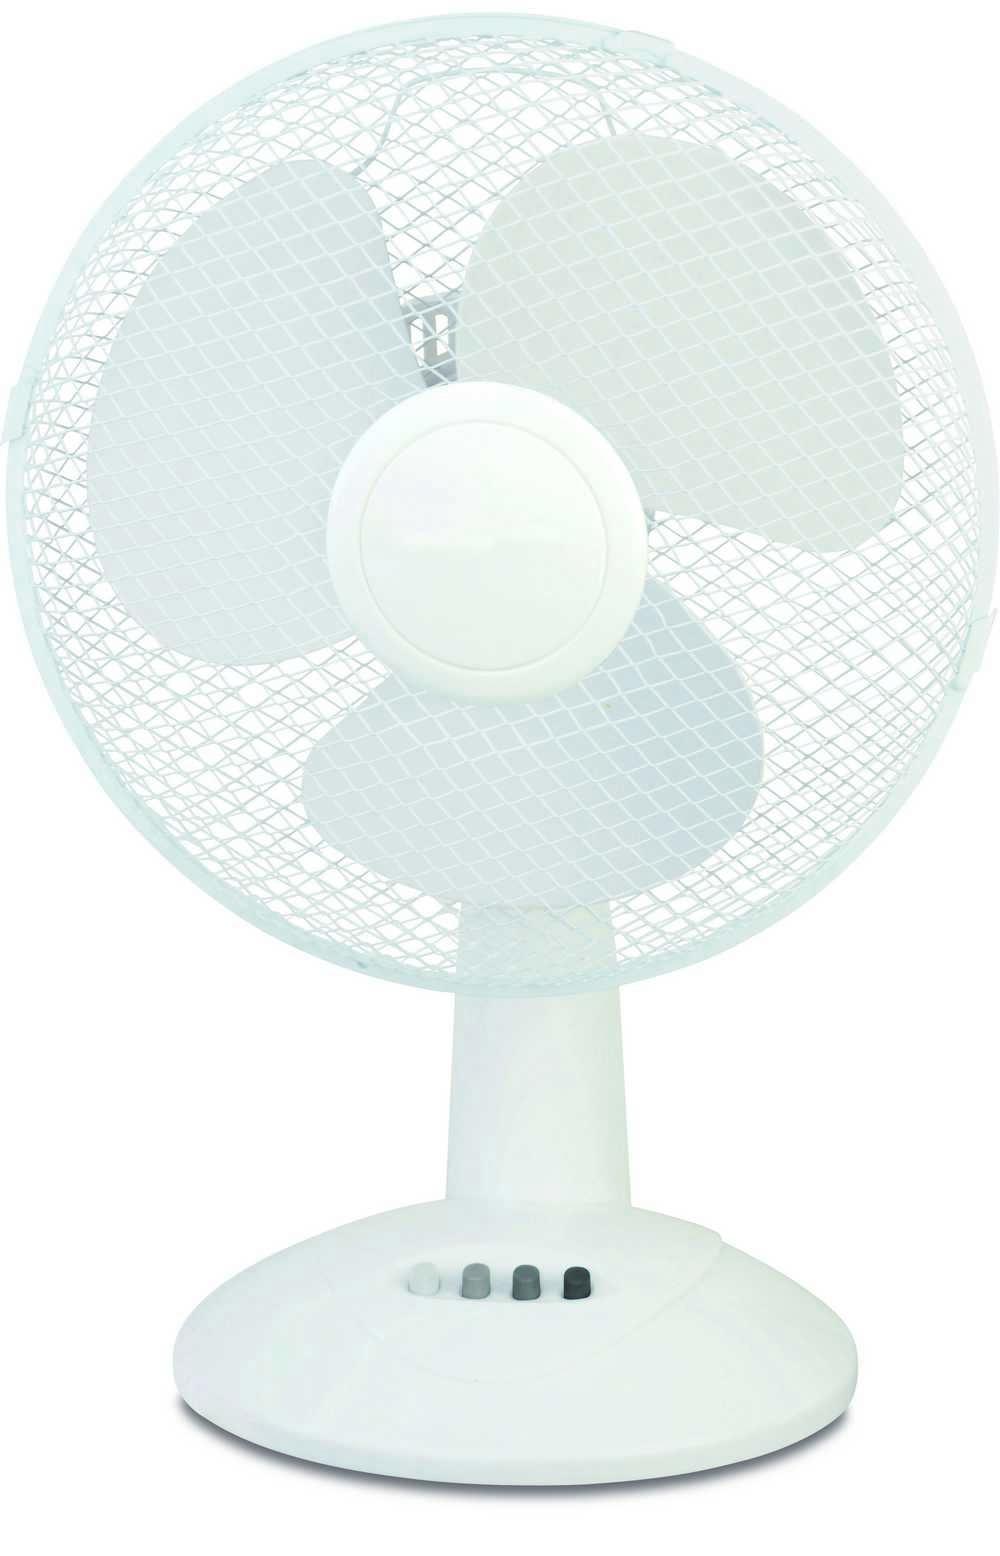 Ventilator tafel 30 cm 3 snelheden wit